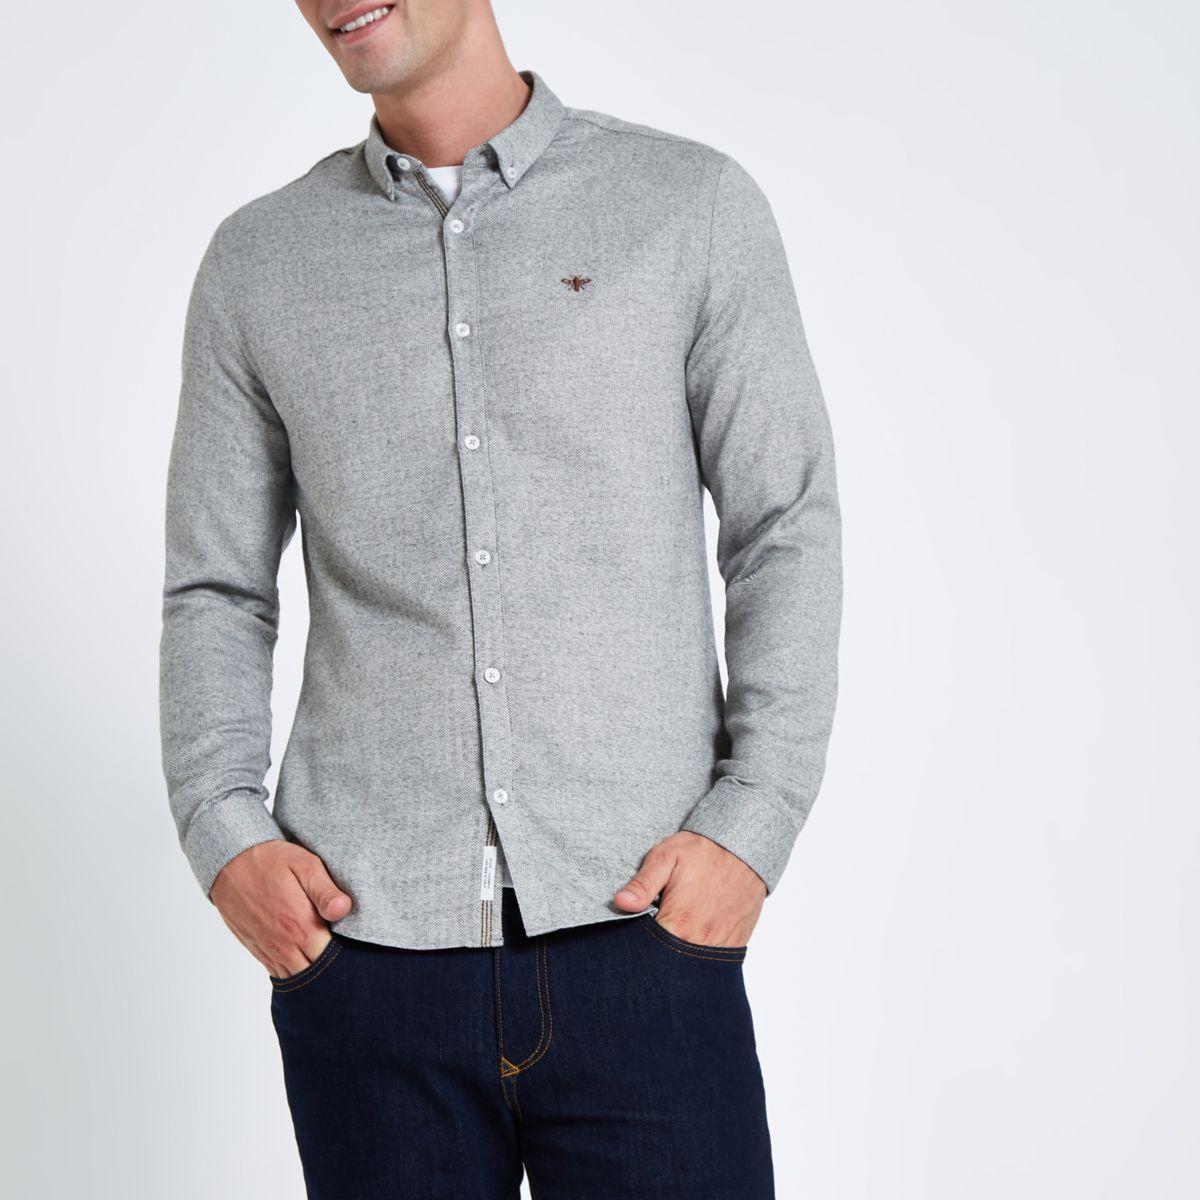 Grey herringbone wasp button up shirt